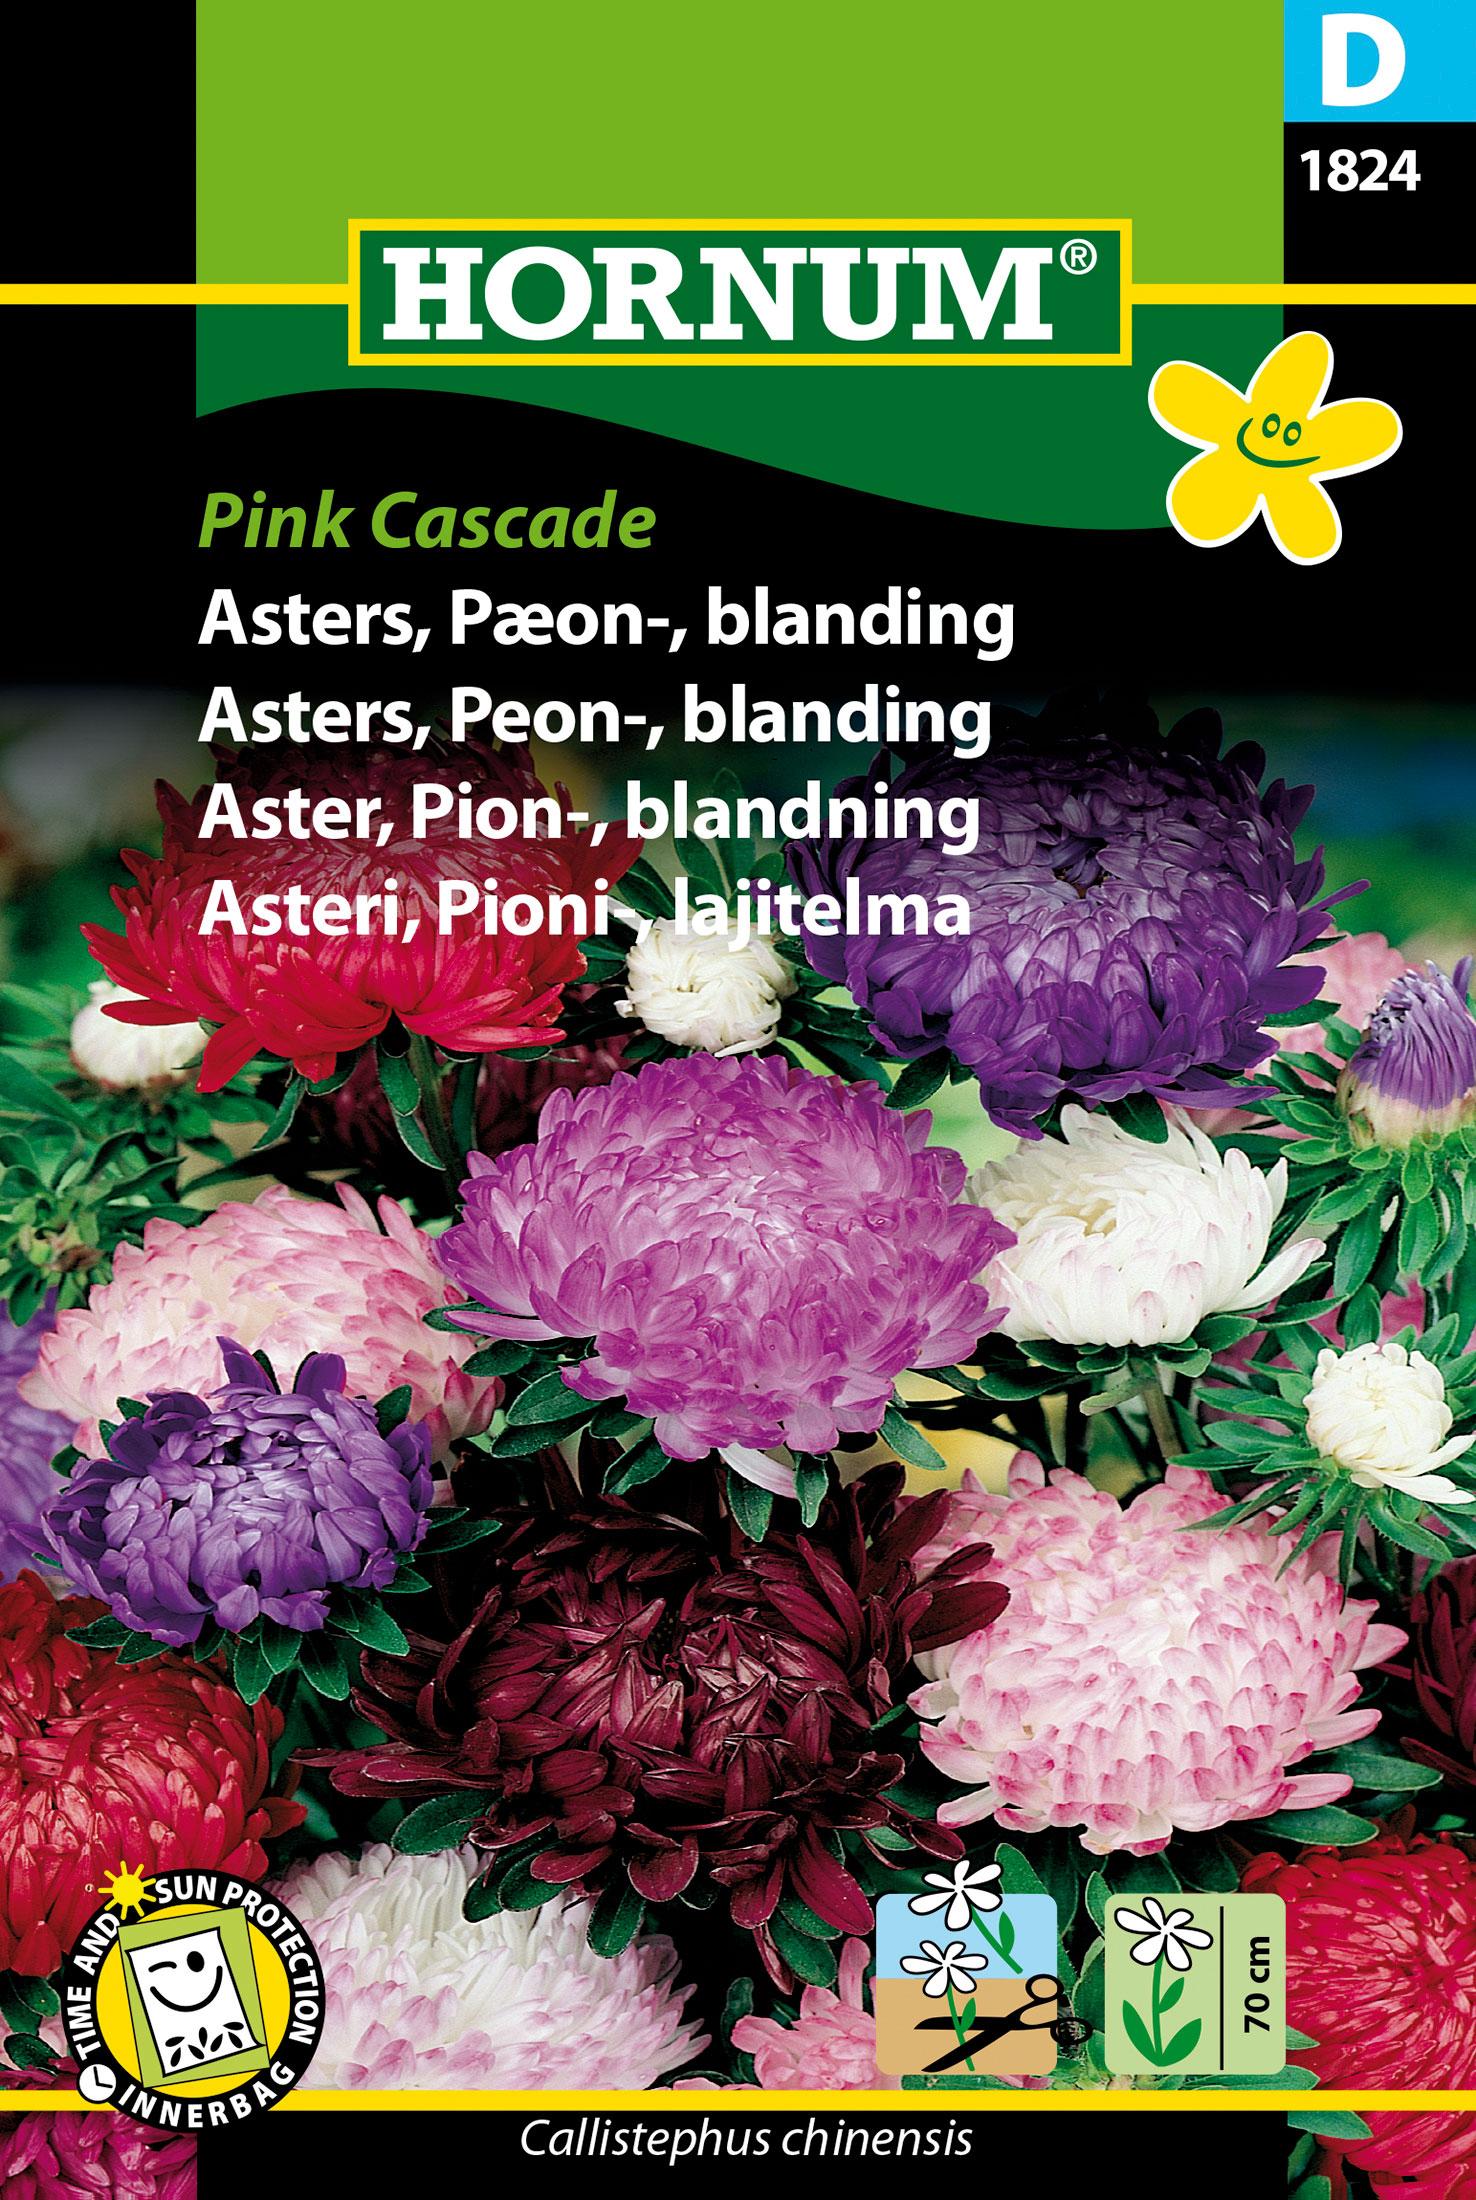 Aster, Pion-, 'Pink Cascade